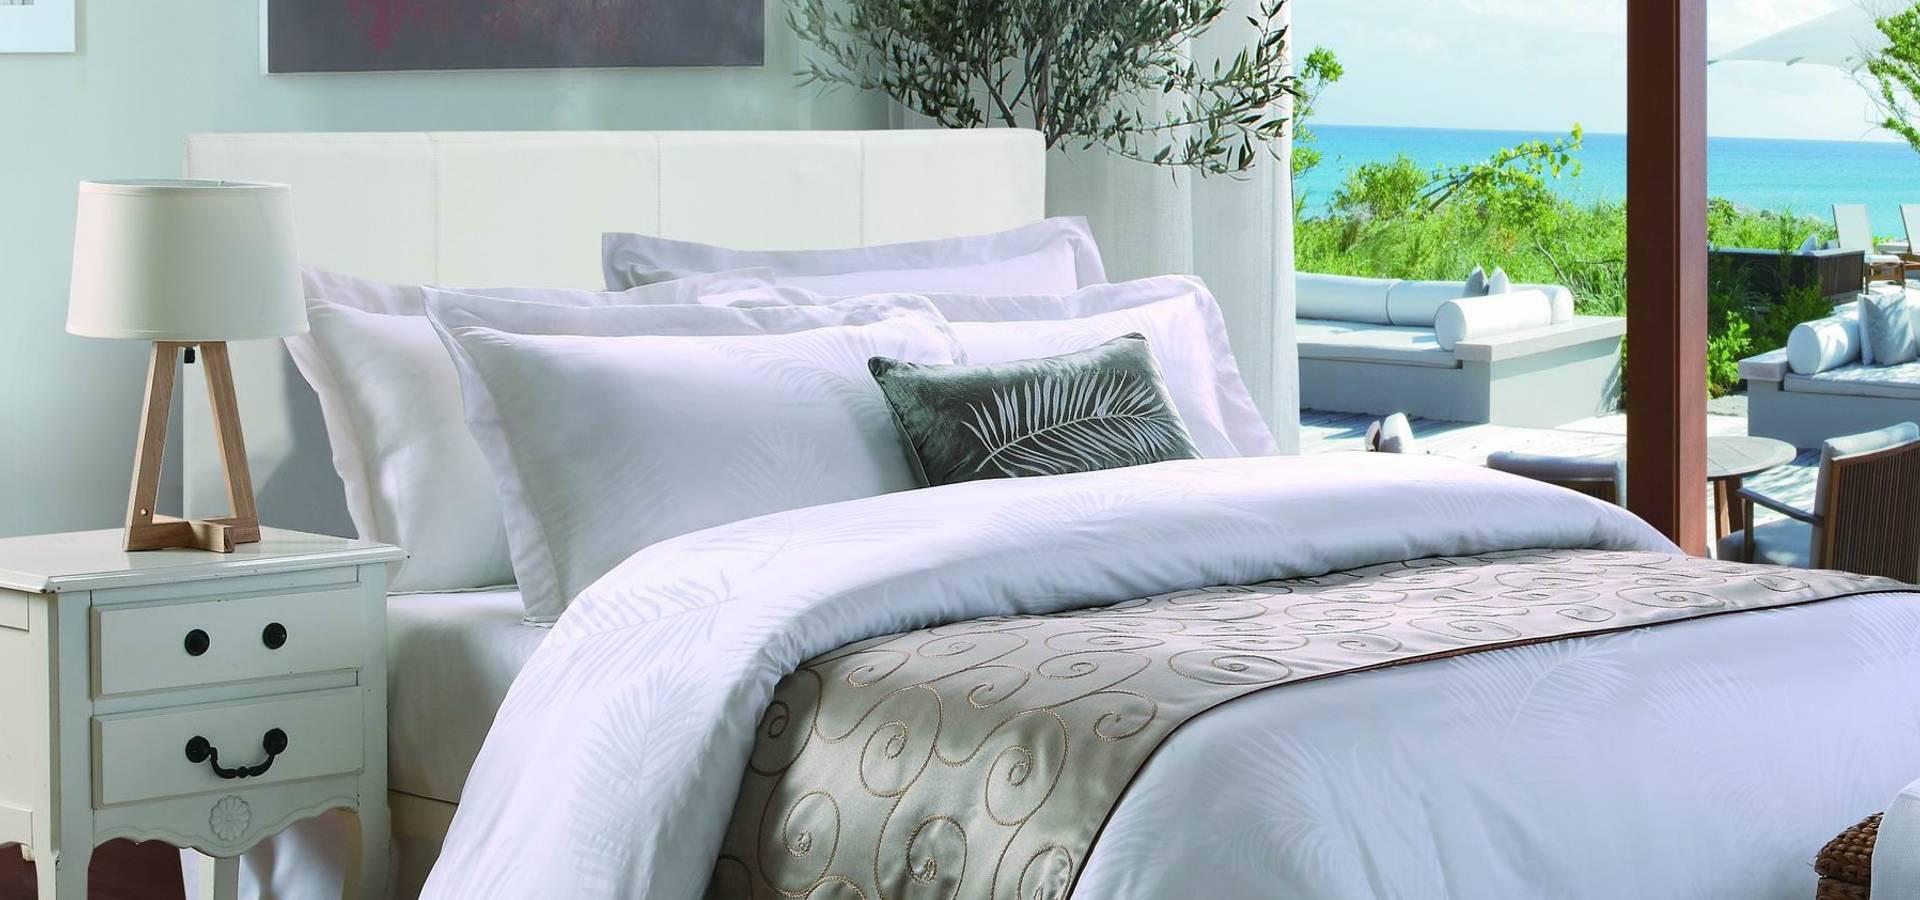 peignoir de bain en pur coton ritz carlton linge de bain por king of cotton france homify. Black Bedroom Furniture Sets. Home Design Ideas